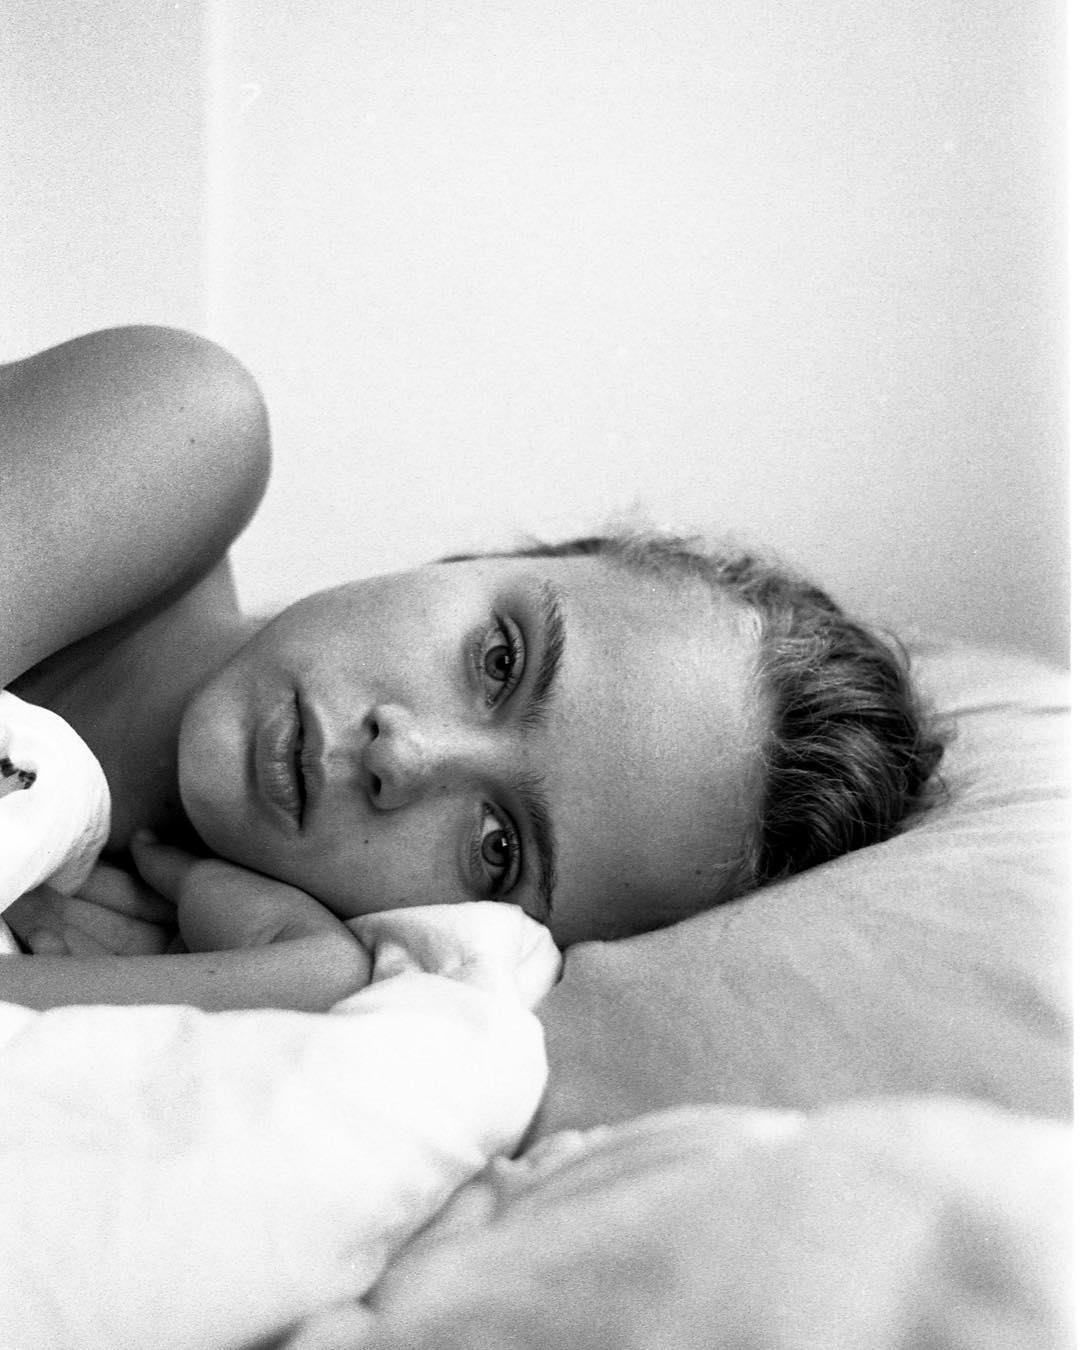 beautiful_black_and_white_portrait_photography_8.jpg